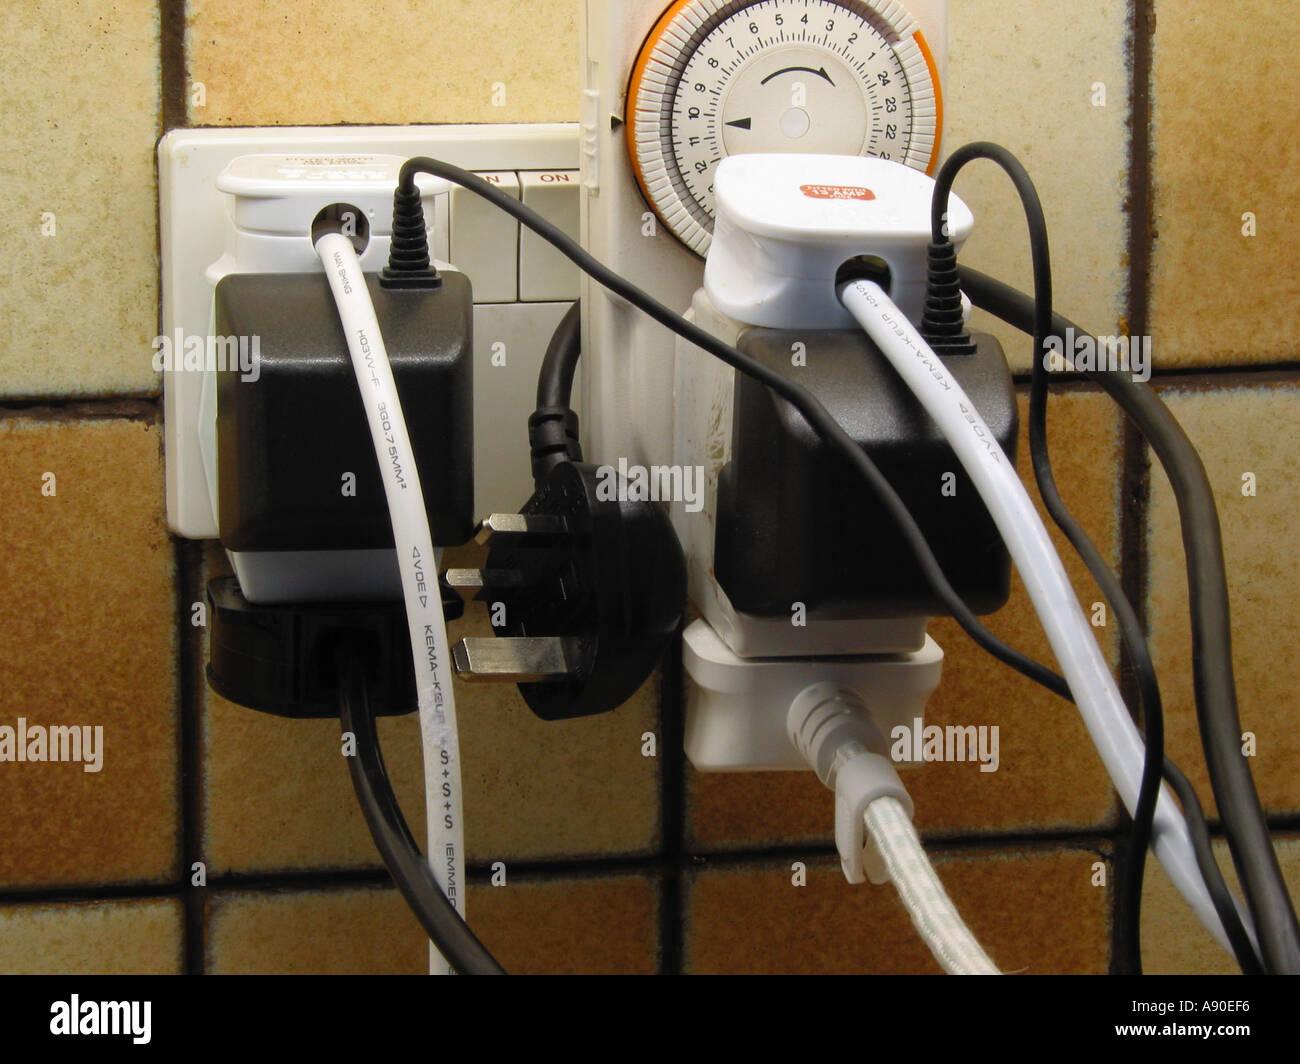 overloaded power sockets stock photo  593654